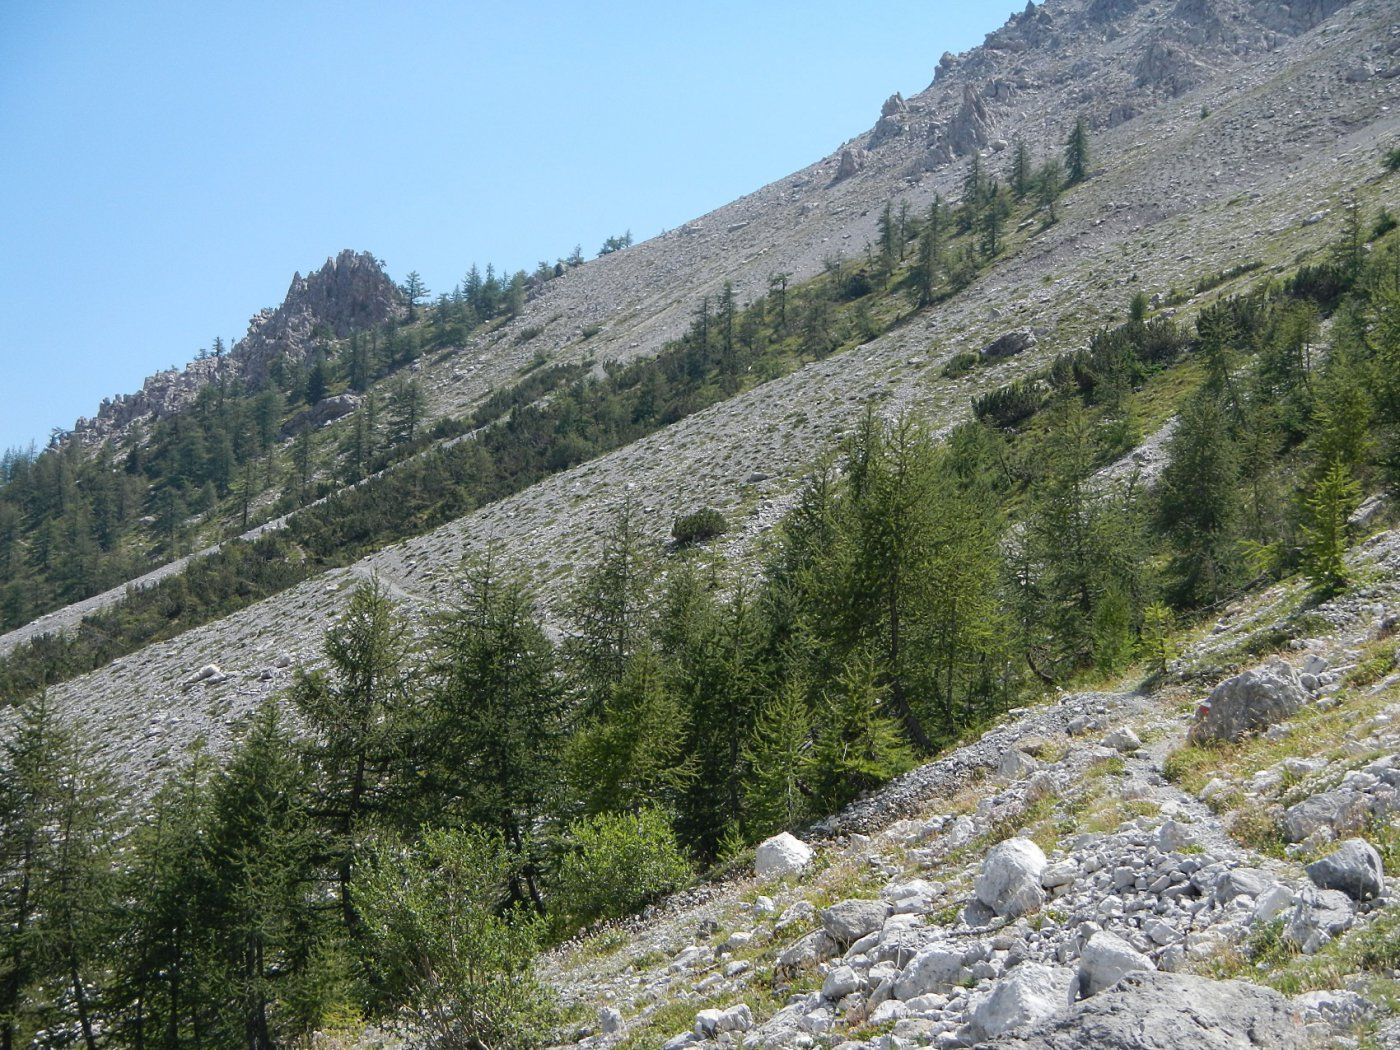 la Roche de la Garde vista (in discesa) dal sentiero Gianluca Molino